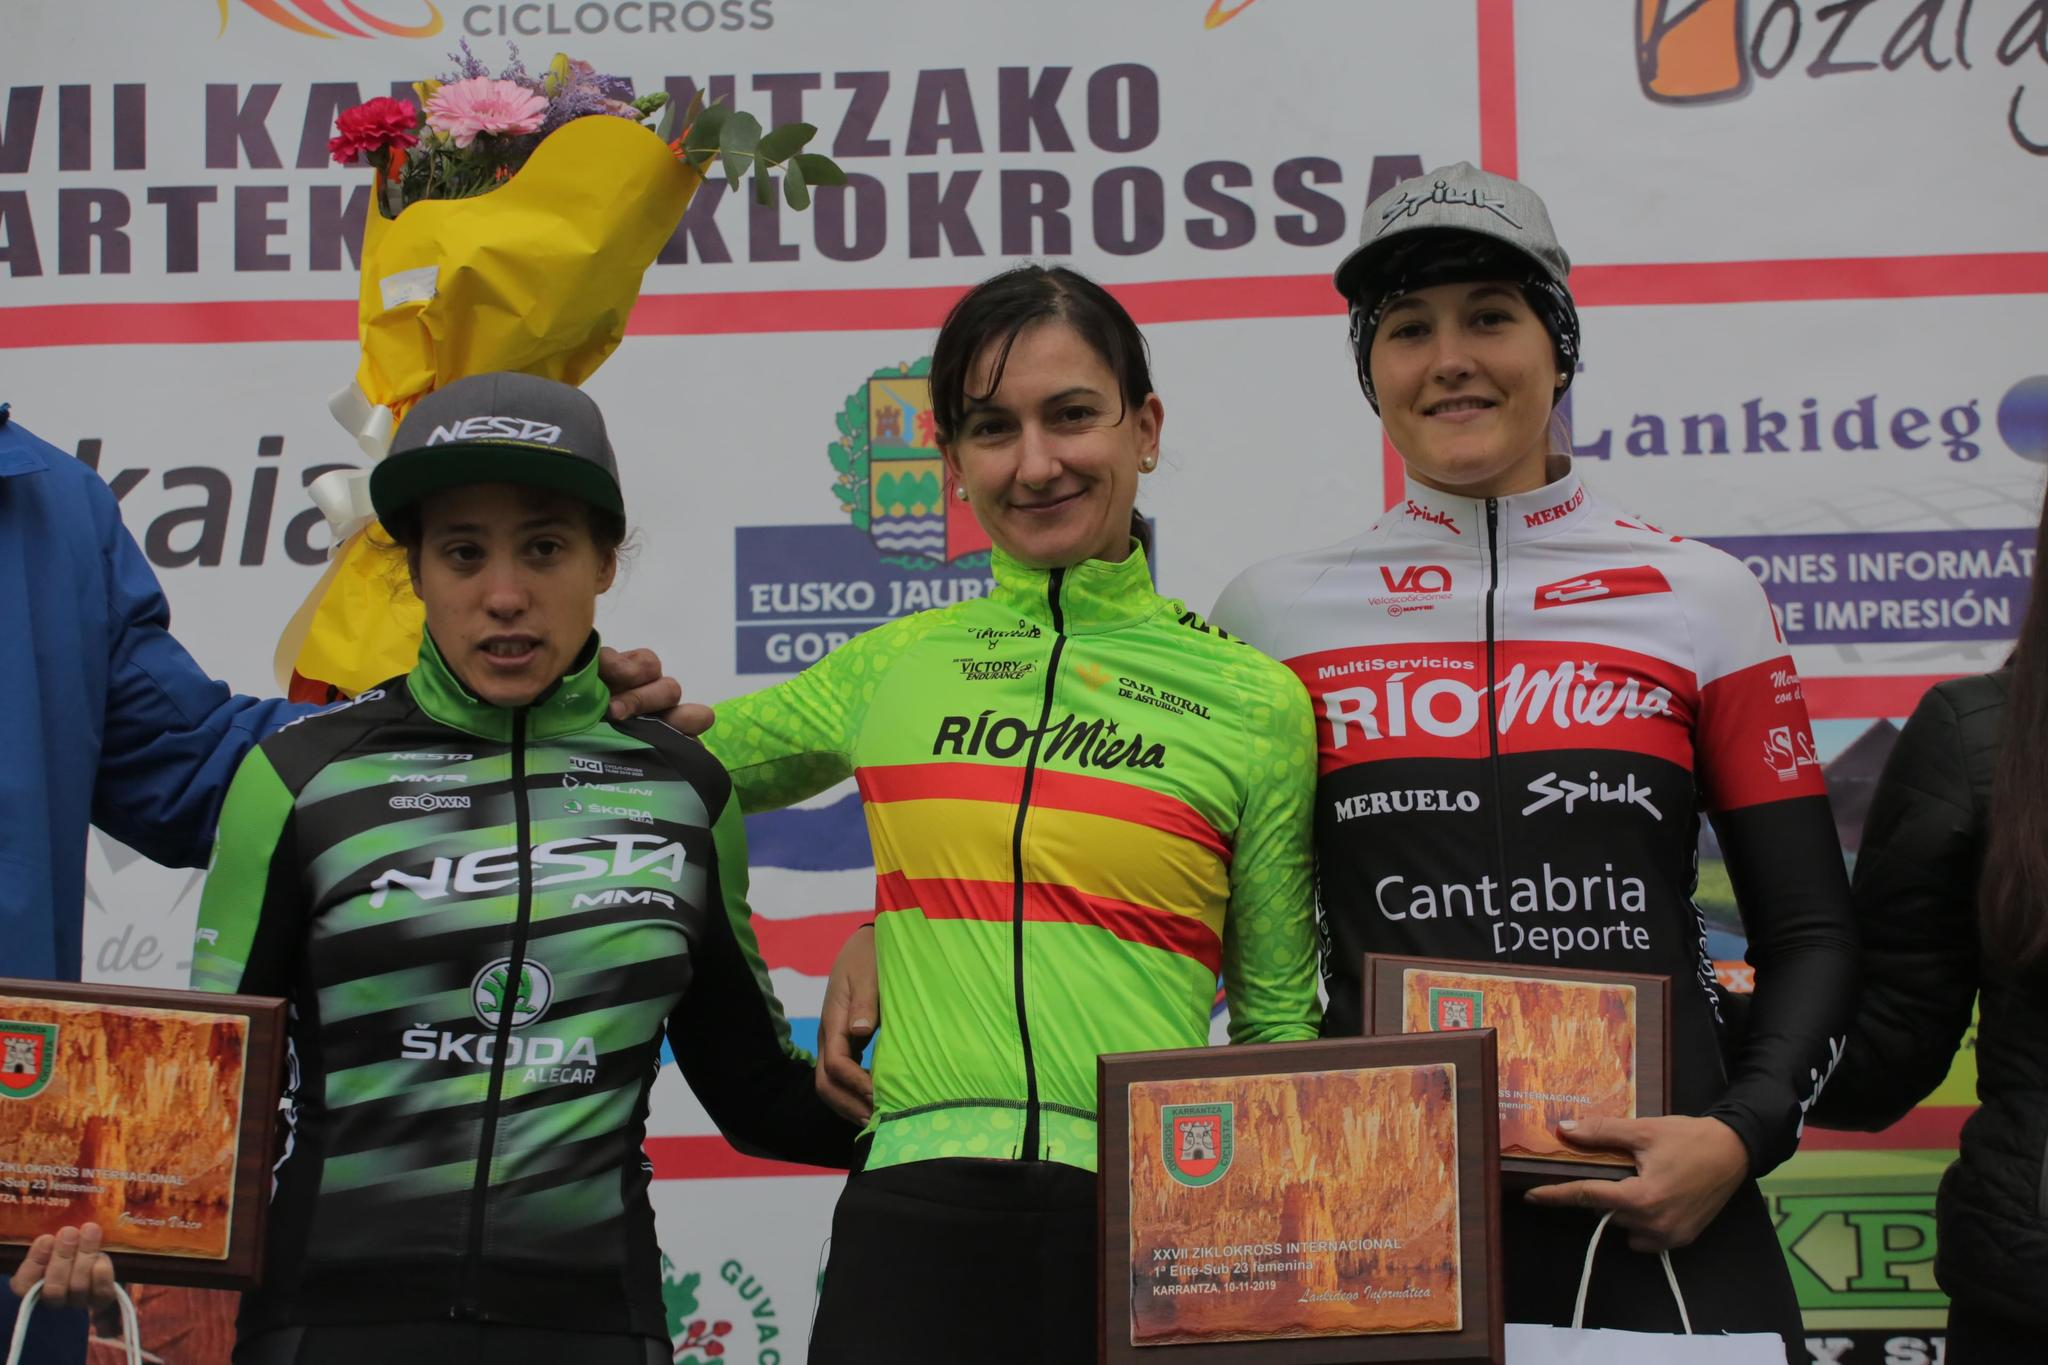 Podio femenino: Lucía González, Aída Nuño y Sandra Trevilla